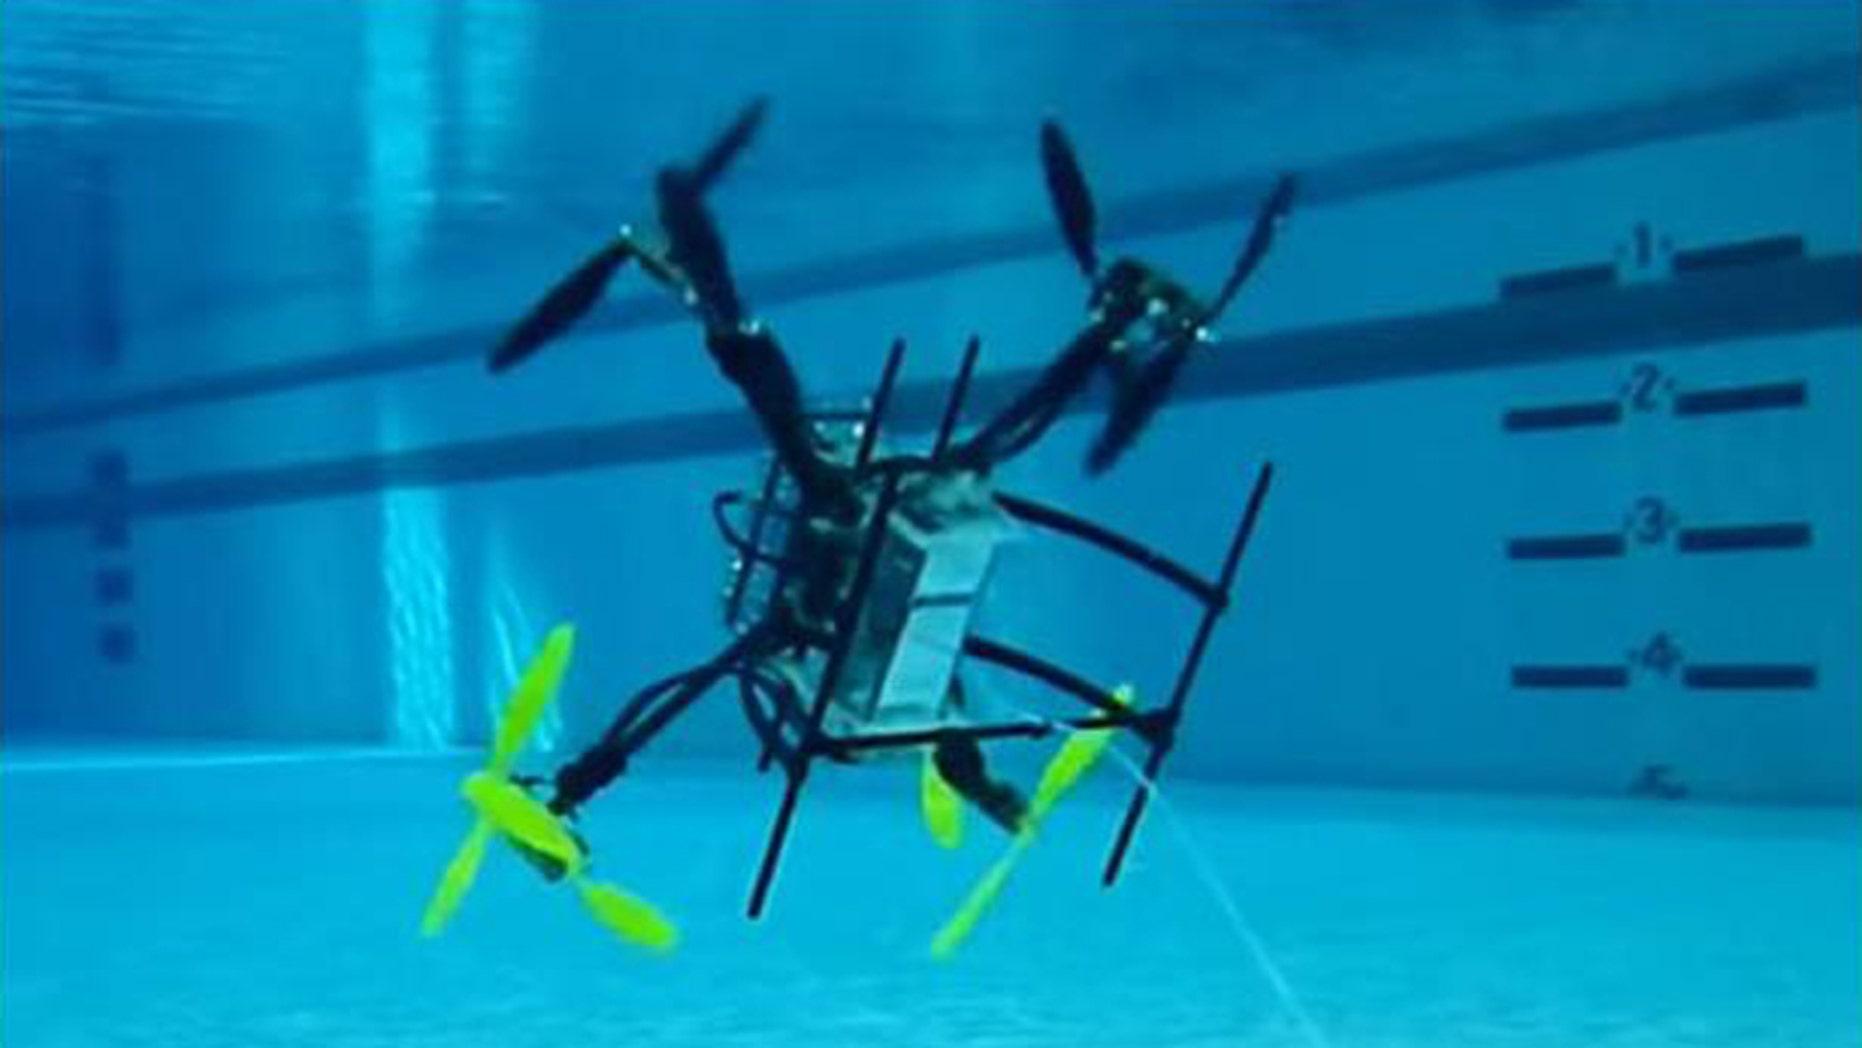 Rutgers University's innovative drone (Image: courtesy Javier Diez).